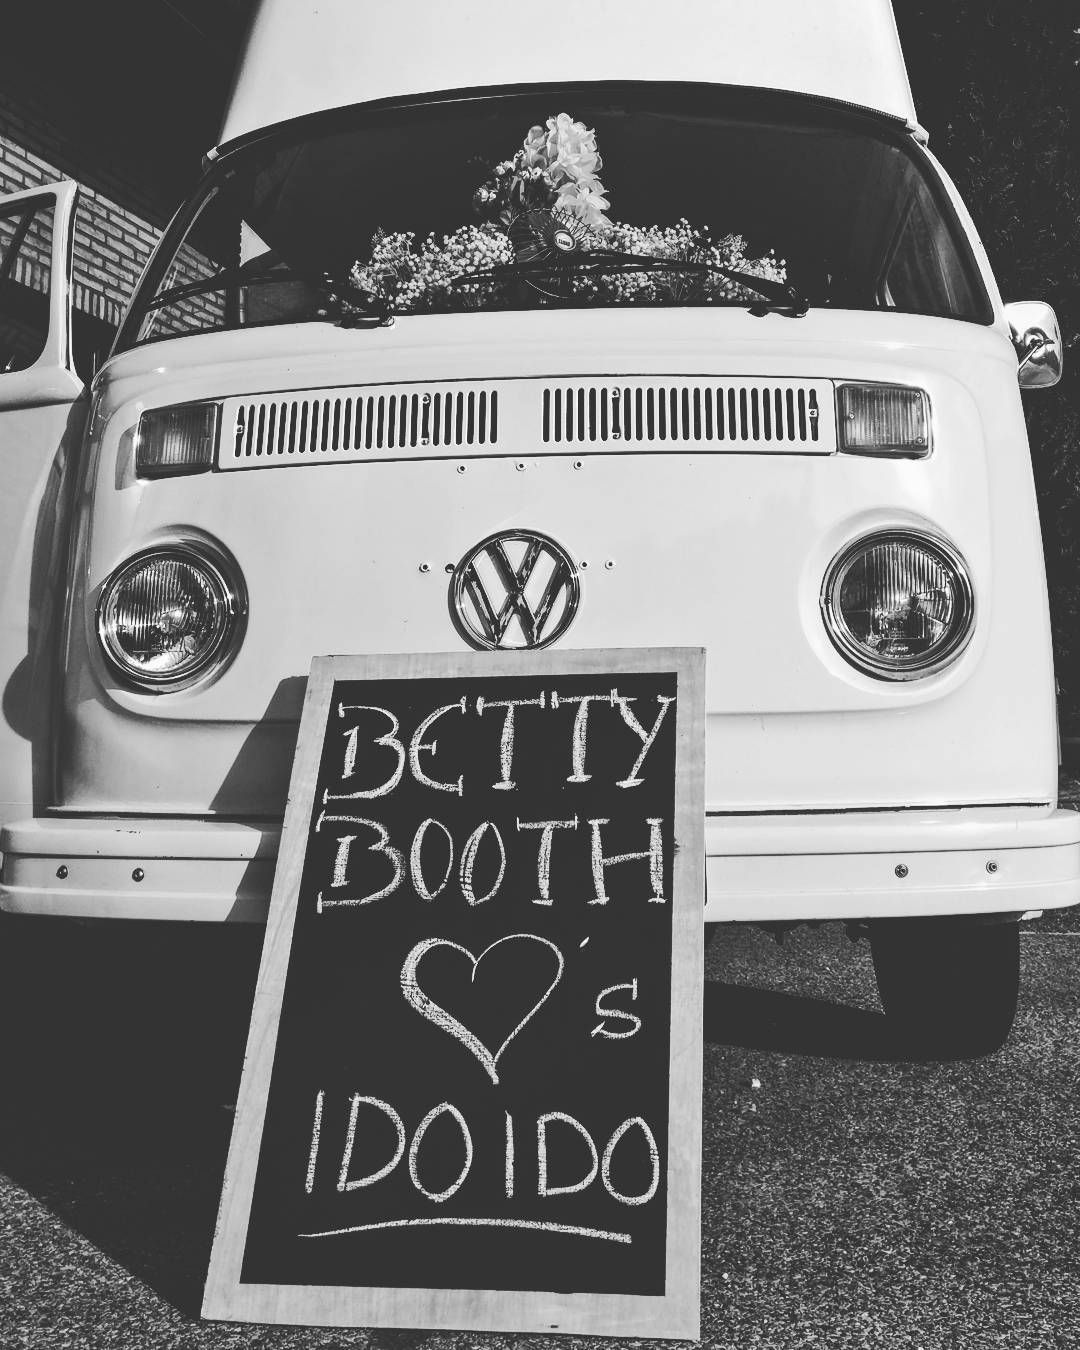 Nog efkes geduld!  @idoido.be  #wedding #iktrouwbelgisch #engagement #idoido #belgium #weddingphotographer #fuji #bnw #demodernetrouwbeurs #weddingplanner #eventplanner #fujixt1 #fujixt10 #vsco #fearlessphotographer #fearlessphotographers #weddingphotography #bridal #fujixseries #bridebusiness #weddings #flowers #weddinginspiration #fashion #flowergirl #buslife #t2 #volkswagen #vw